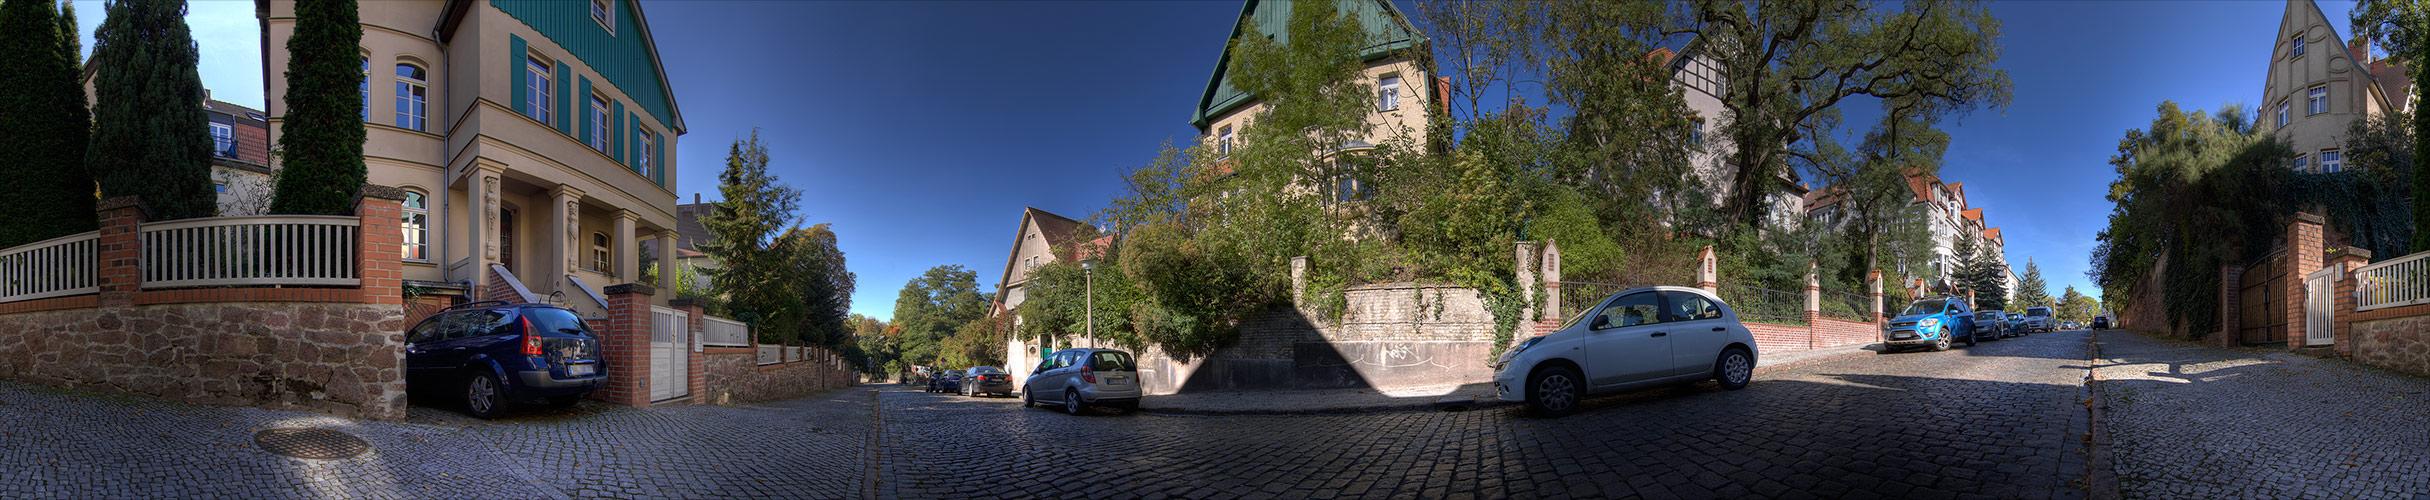 obere Wittekindstraße